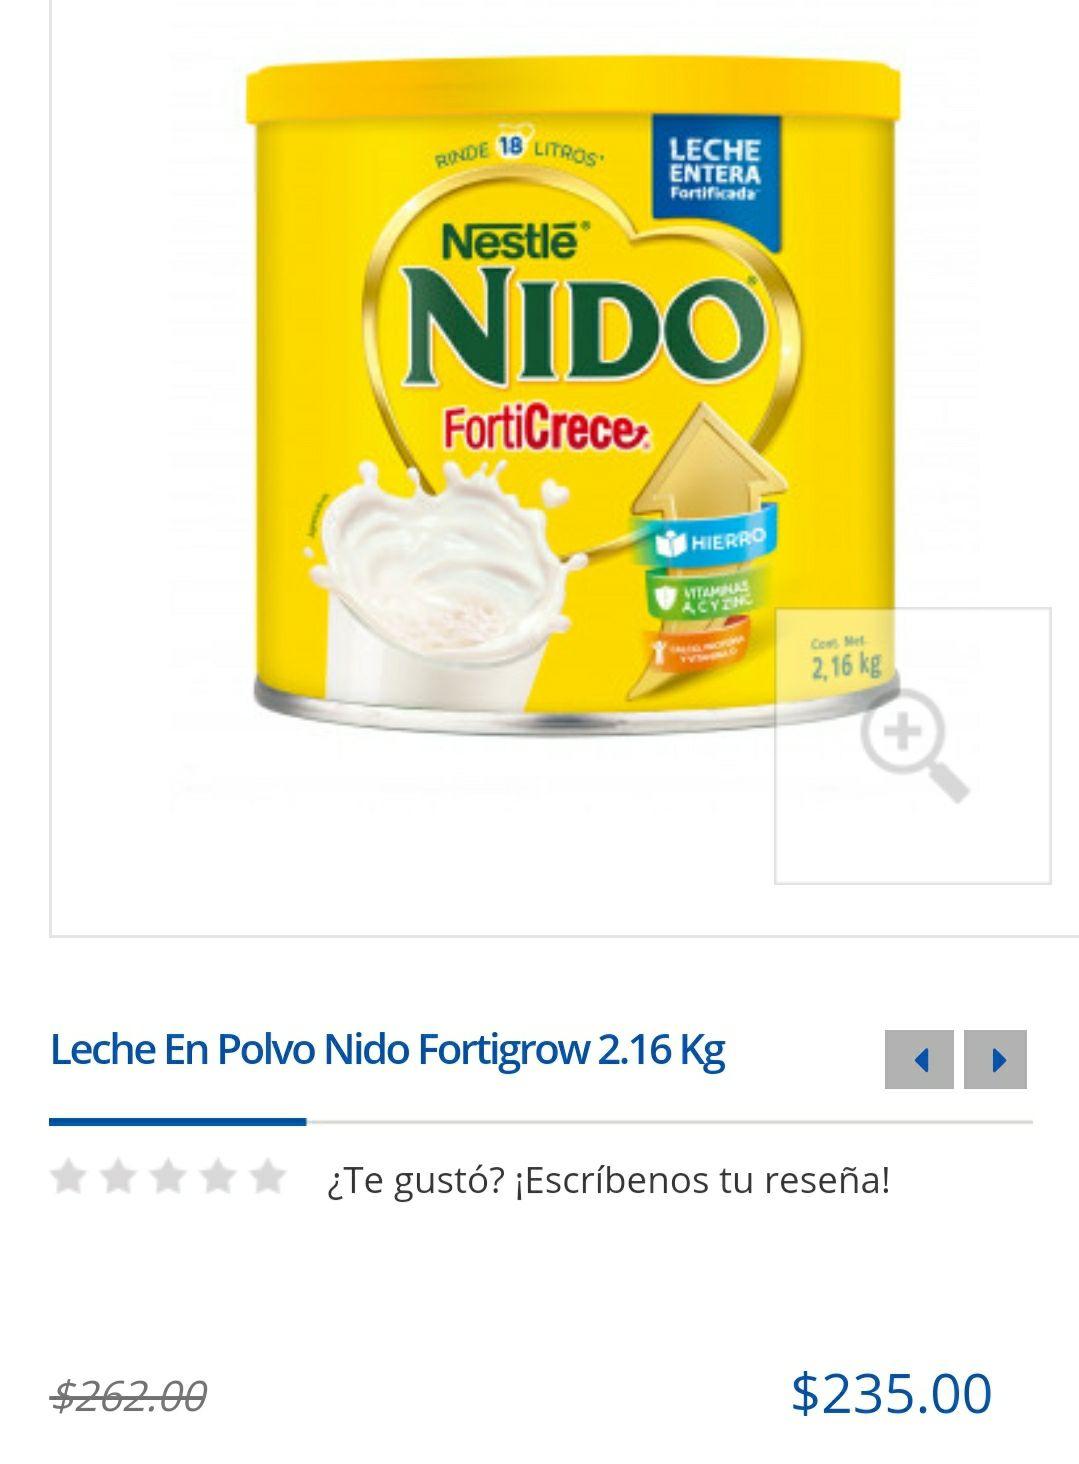 Farmacia del Ahrrro: Nido Fortigrow 2.16kg